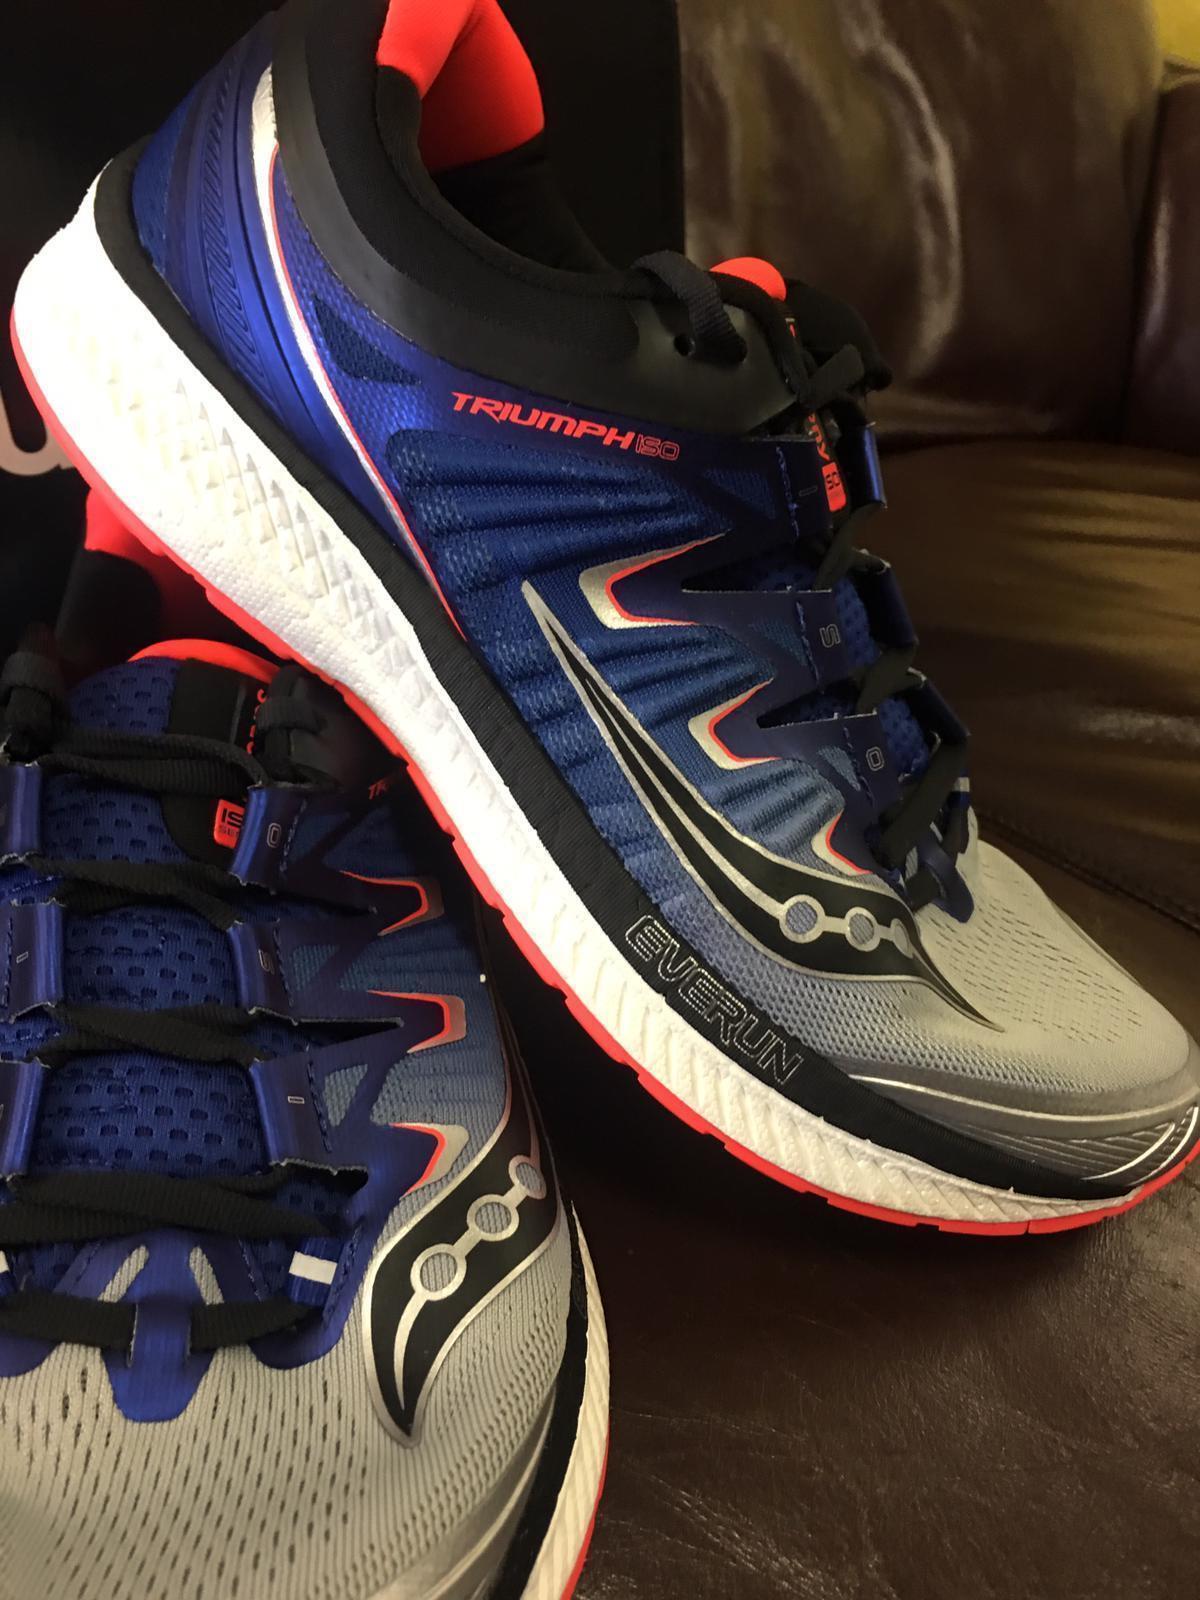 2006b71c13c Saucony Triumph ISO4 Sample Sample Sample Sliver bluee VizRed Running  shoes s Men s US 9 (E